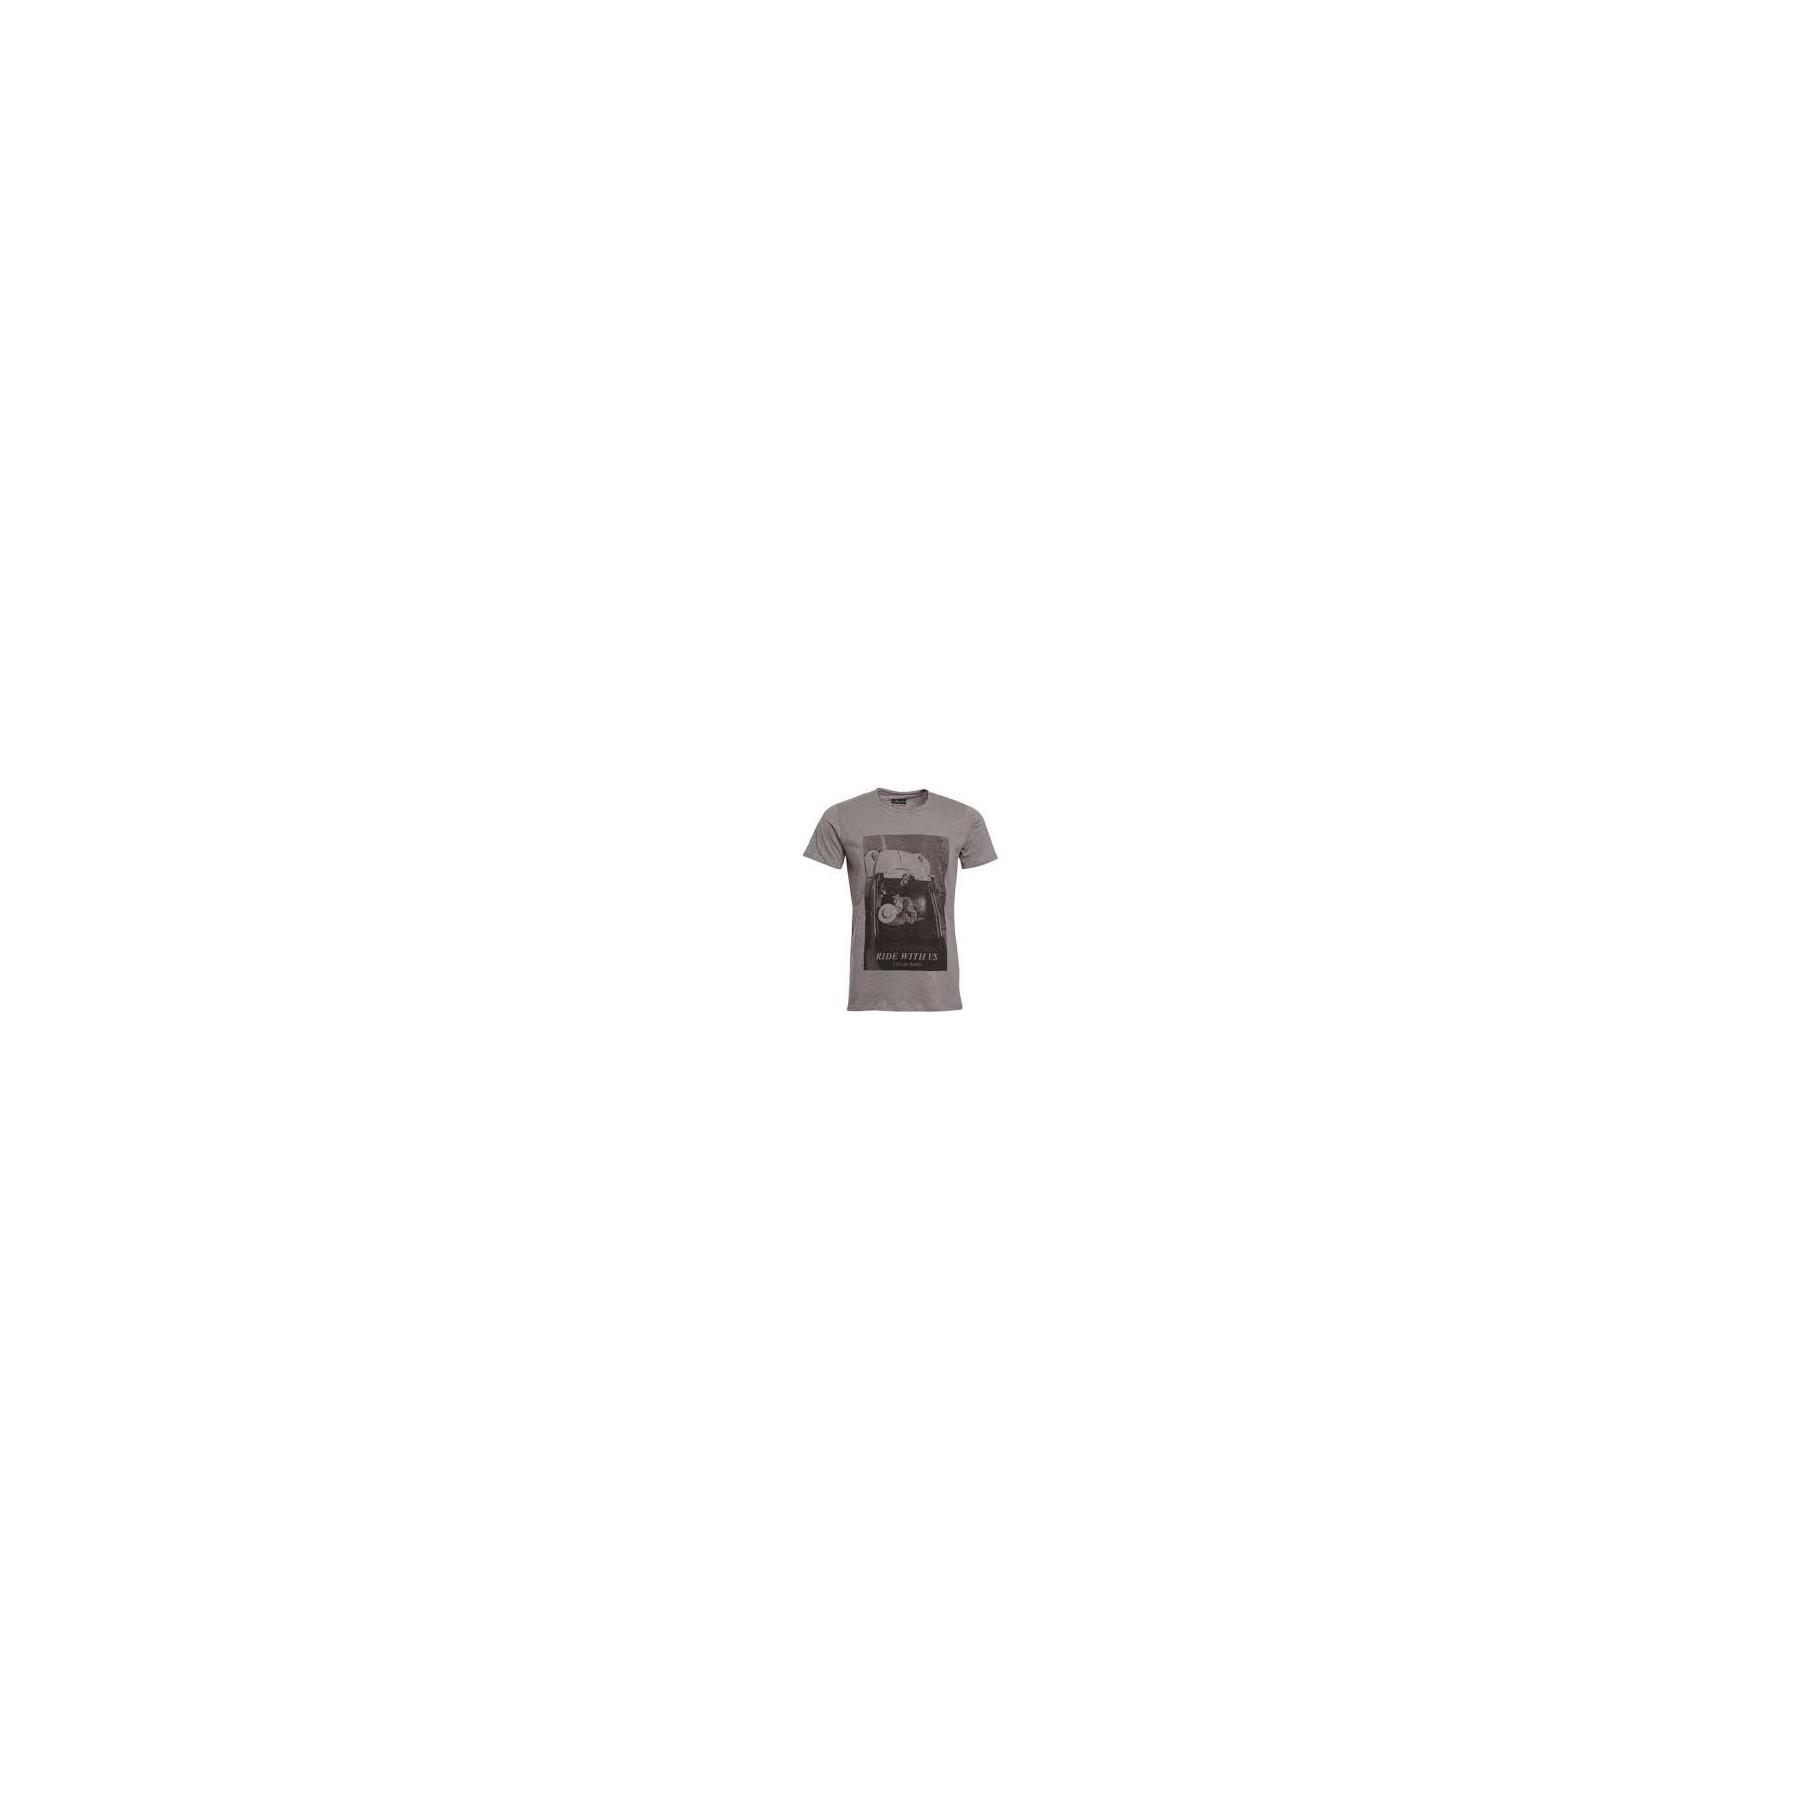 MAGLIETTA SPACE MONKEYS T-SHIRT RIDE Grey